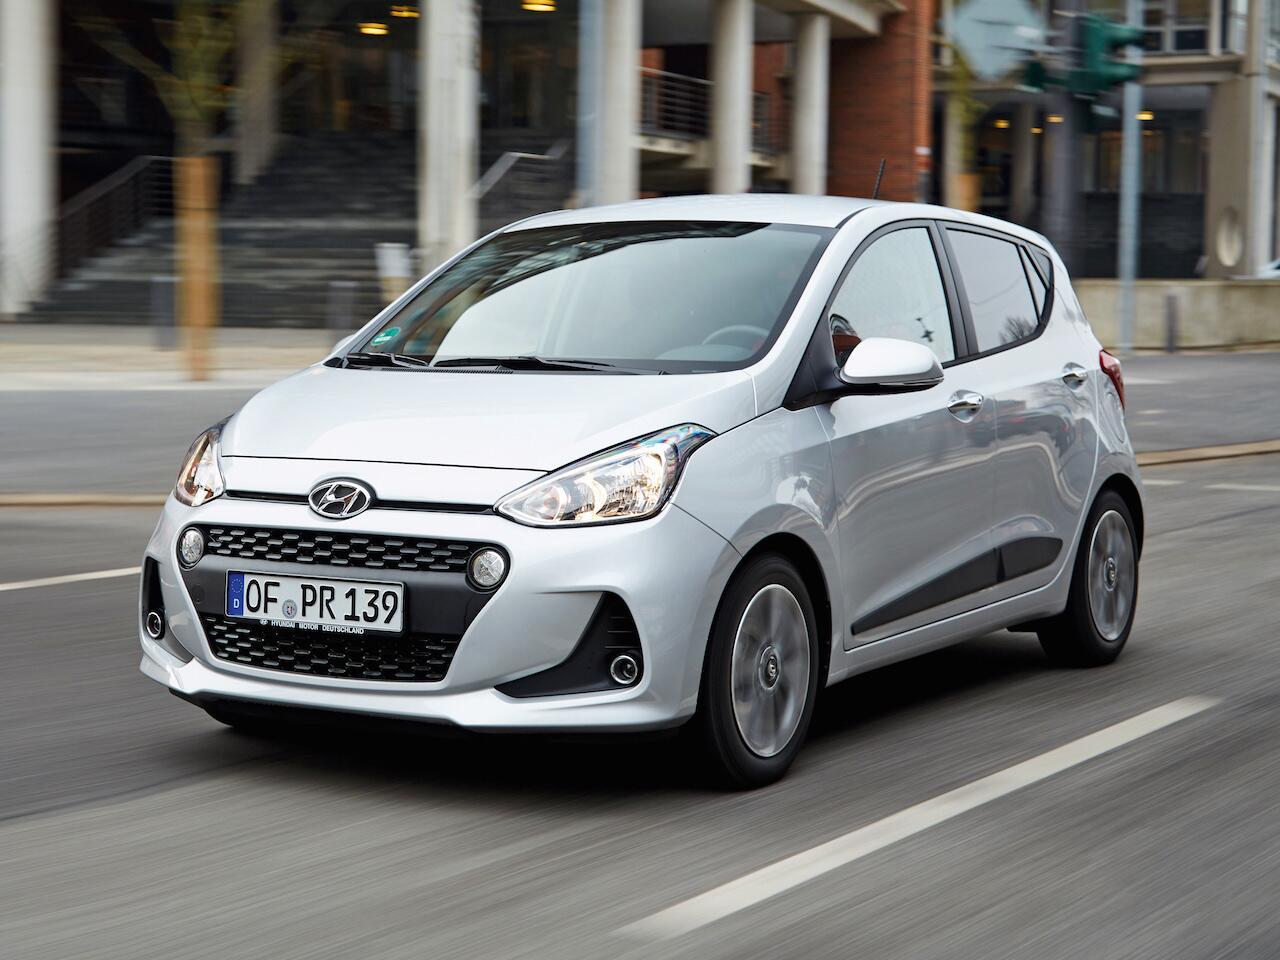 Bild zu Platz 2: Hyundai i10